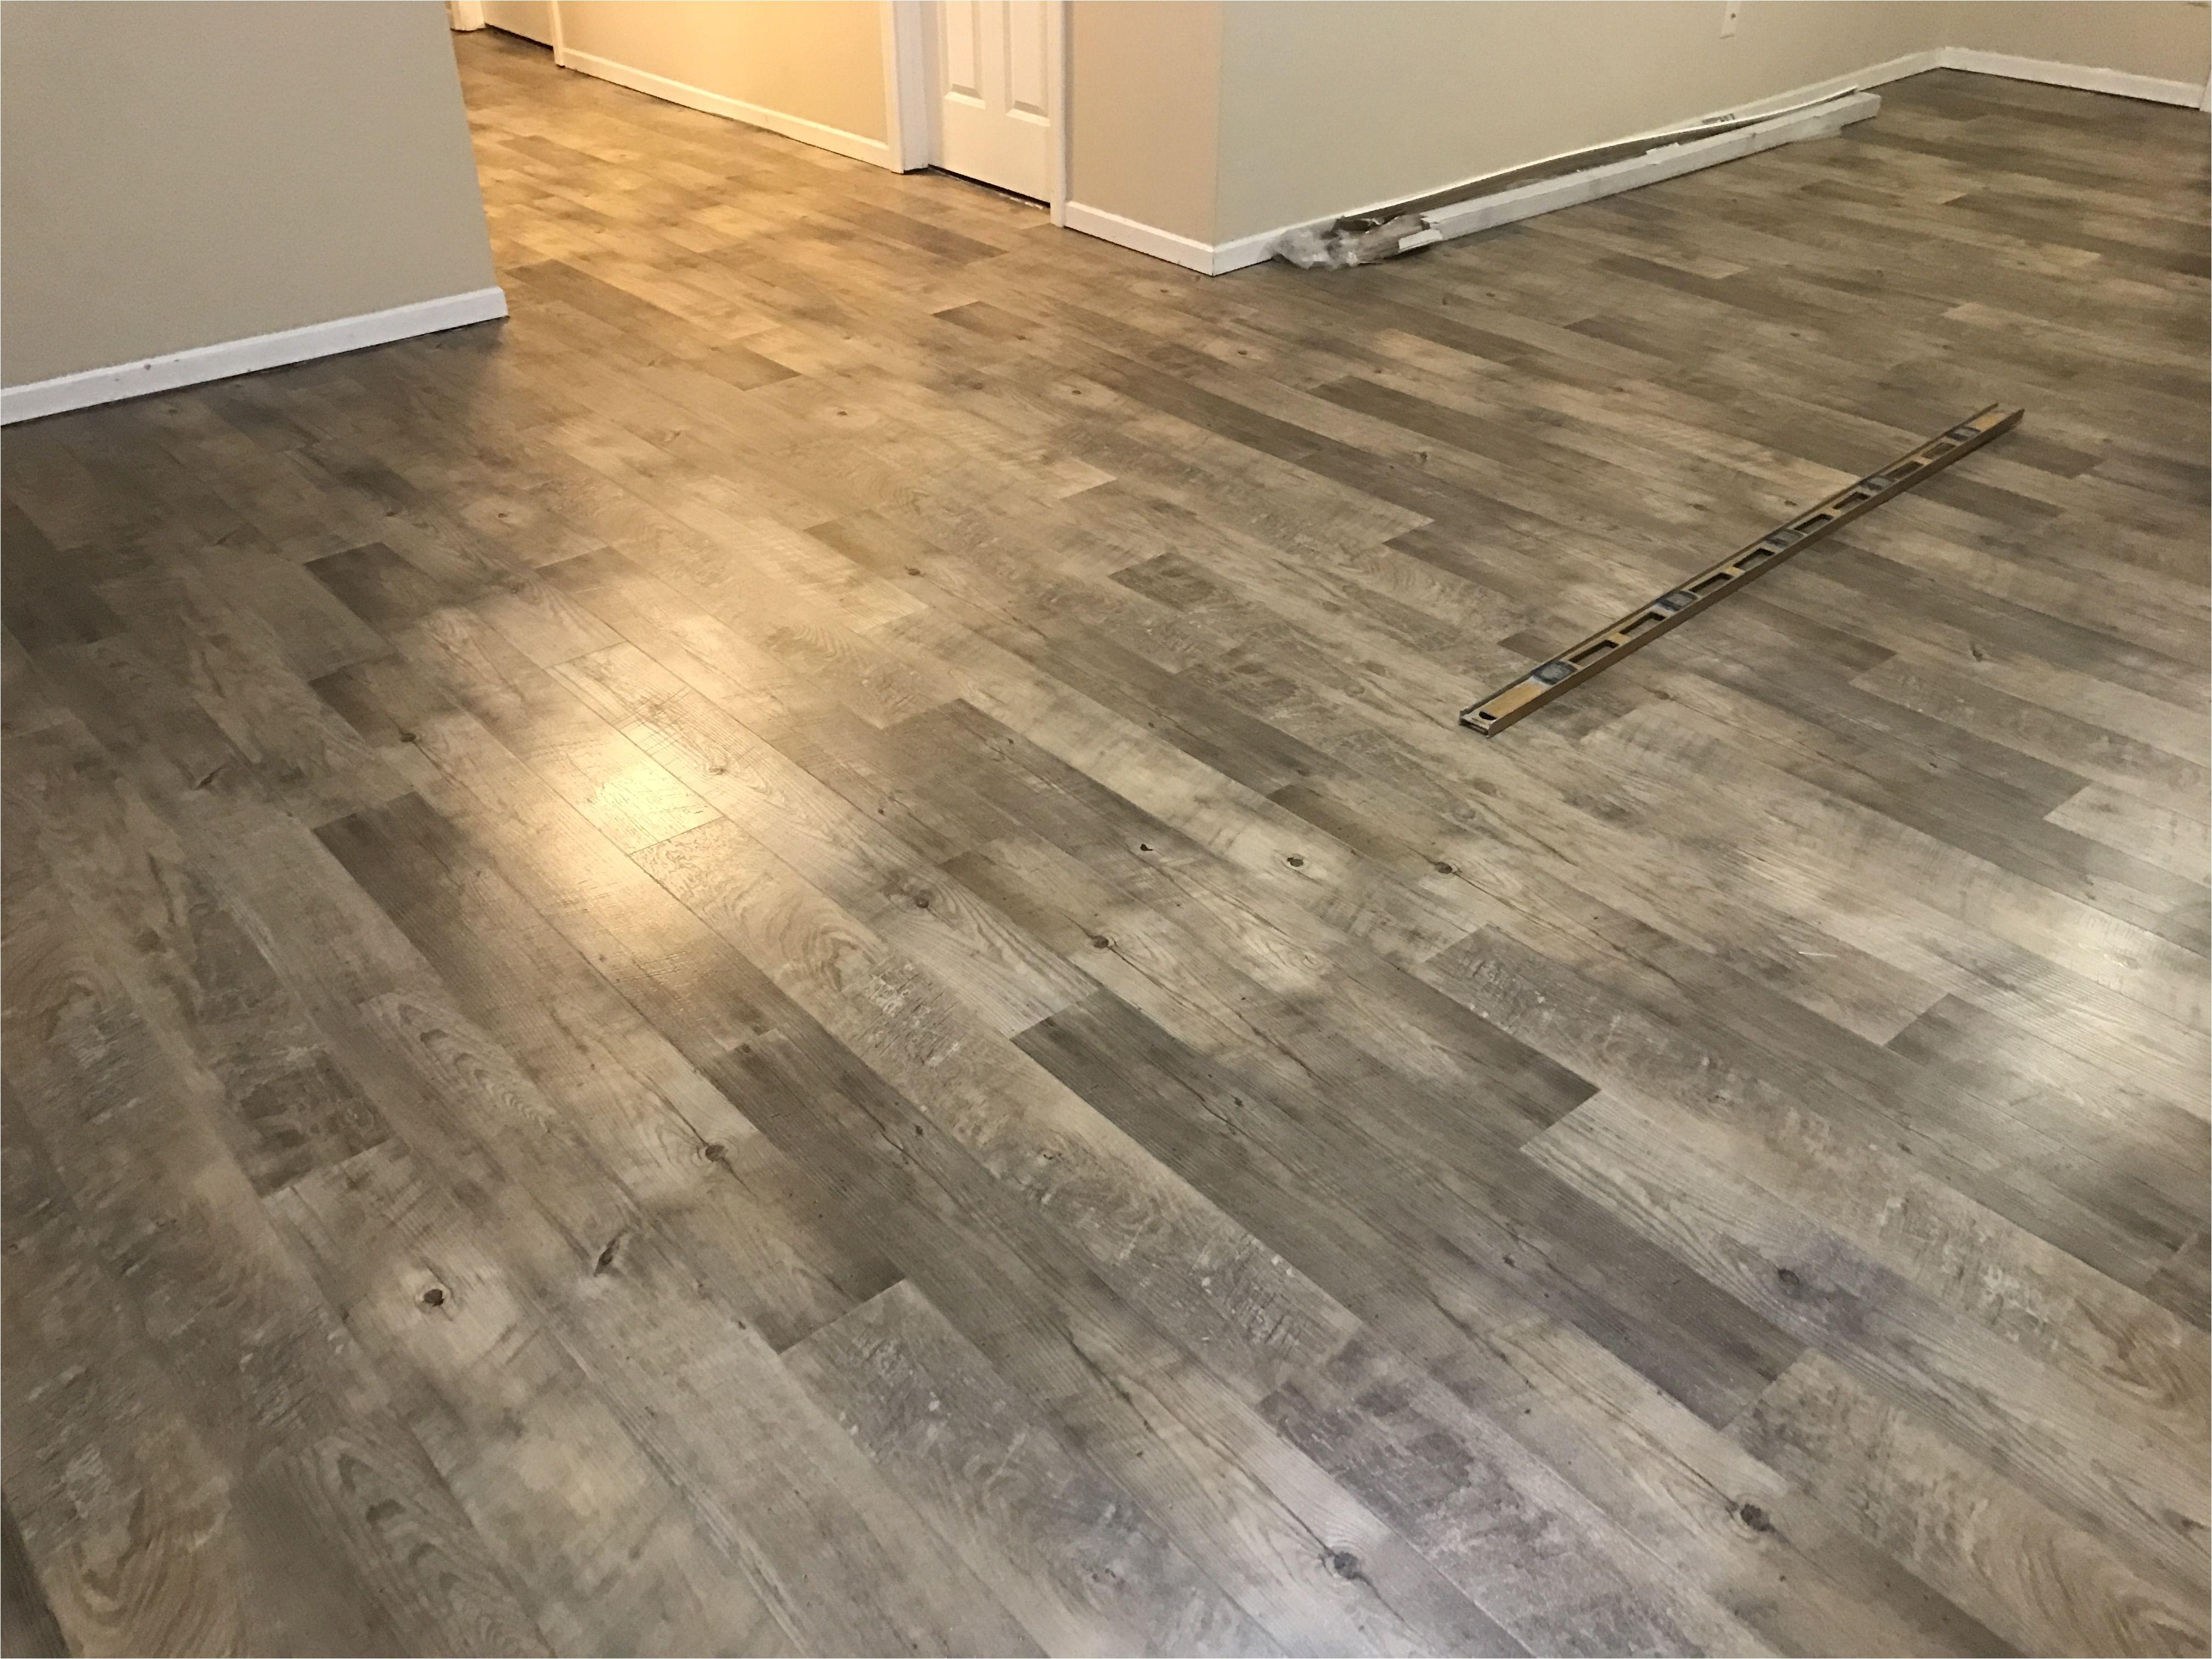 dockside sand mannington adura luxury vinyl plank glue down in basement